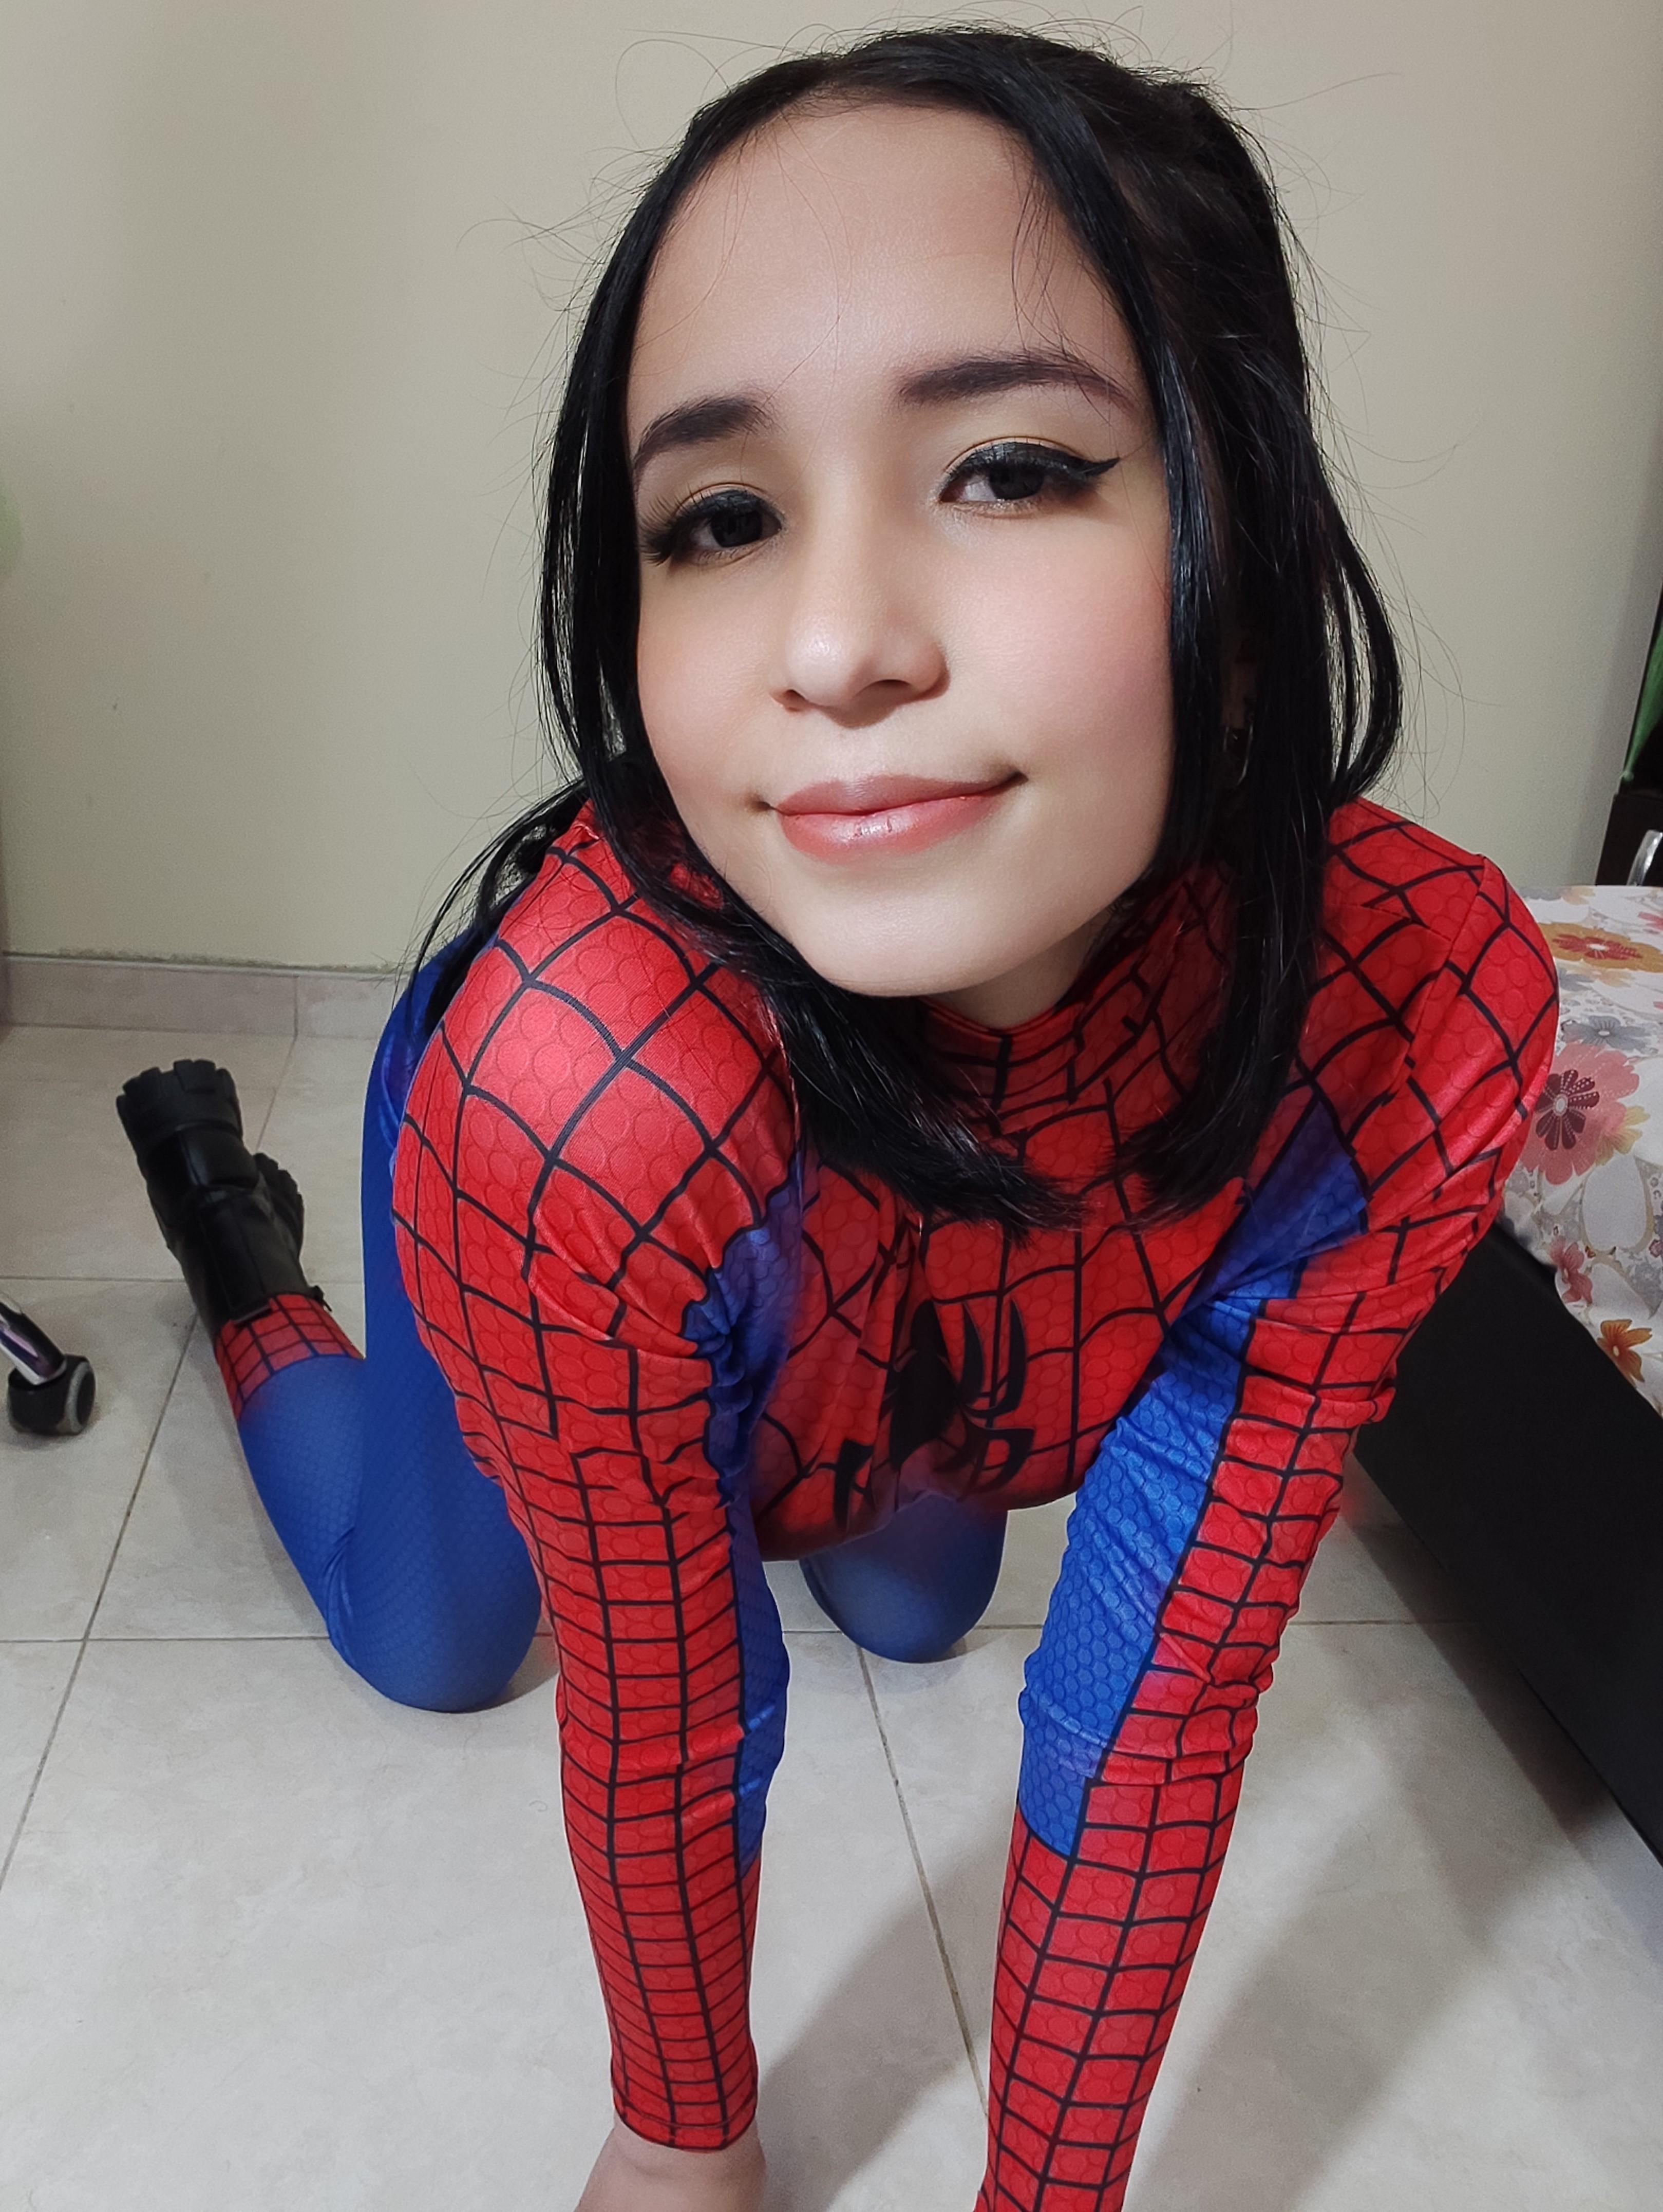 Chica kawaii?s=hyzmbu6mlipqsgddk0bxmm8nzioocvml7wttxqz6efc=